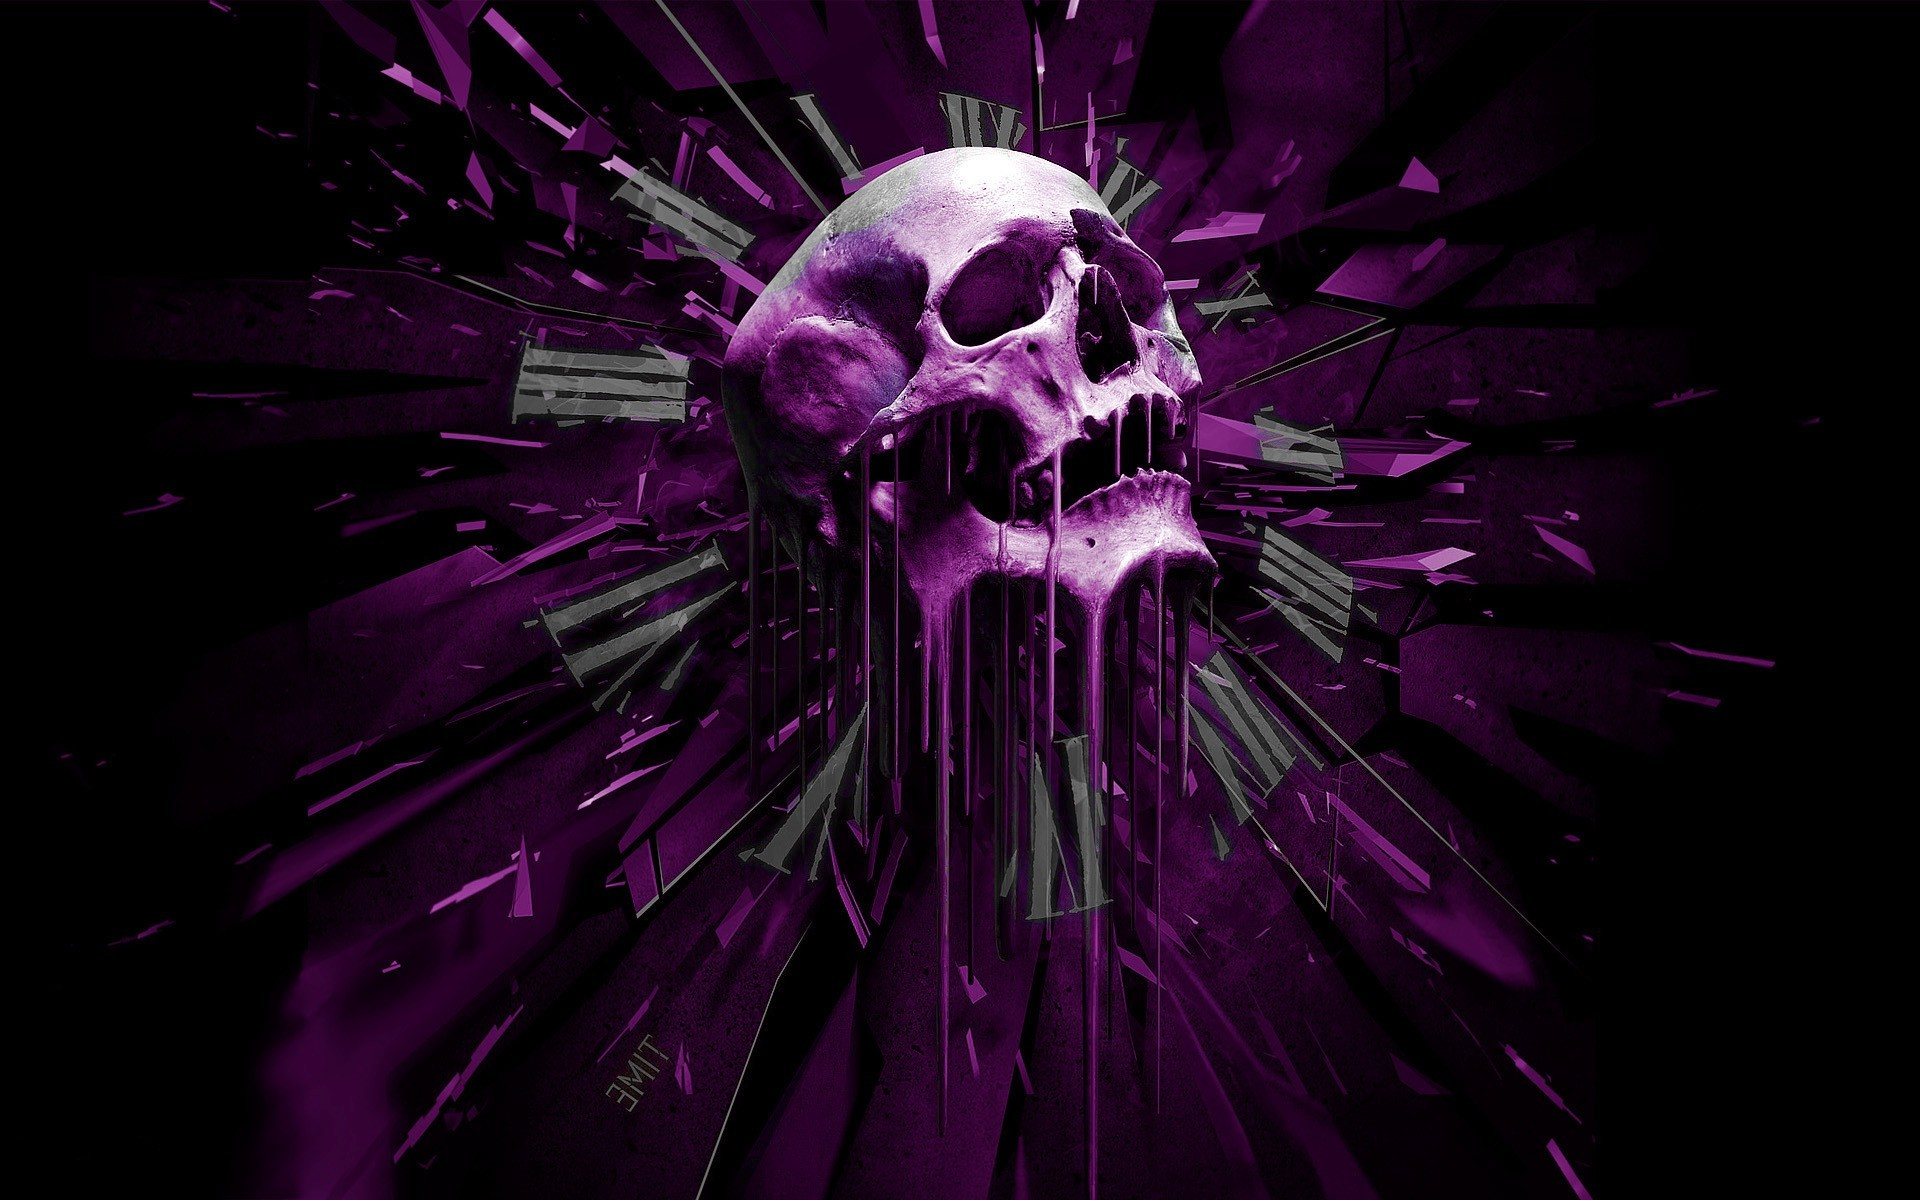 Abstract Skull Wallpaper (73+ images)